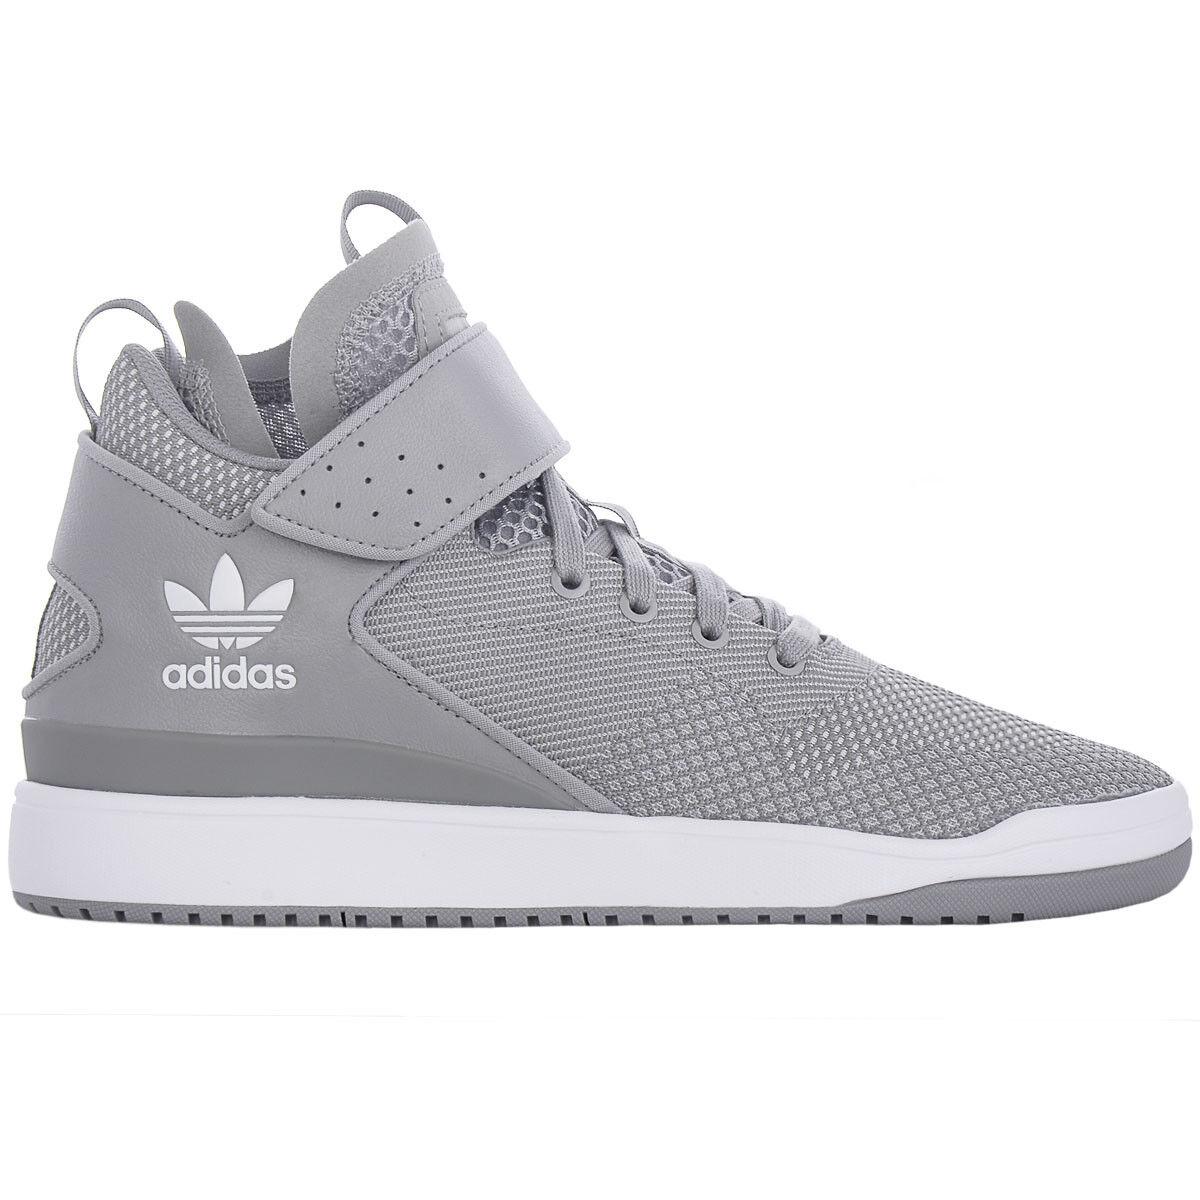 adidas Originals Vertias-X Weave Schuhe Grau Herren Sneaker Basketball S75645